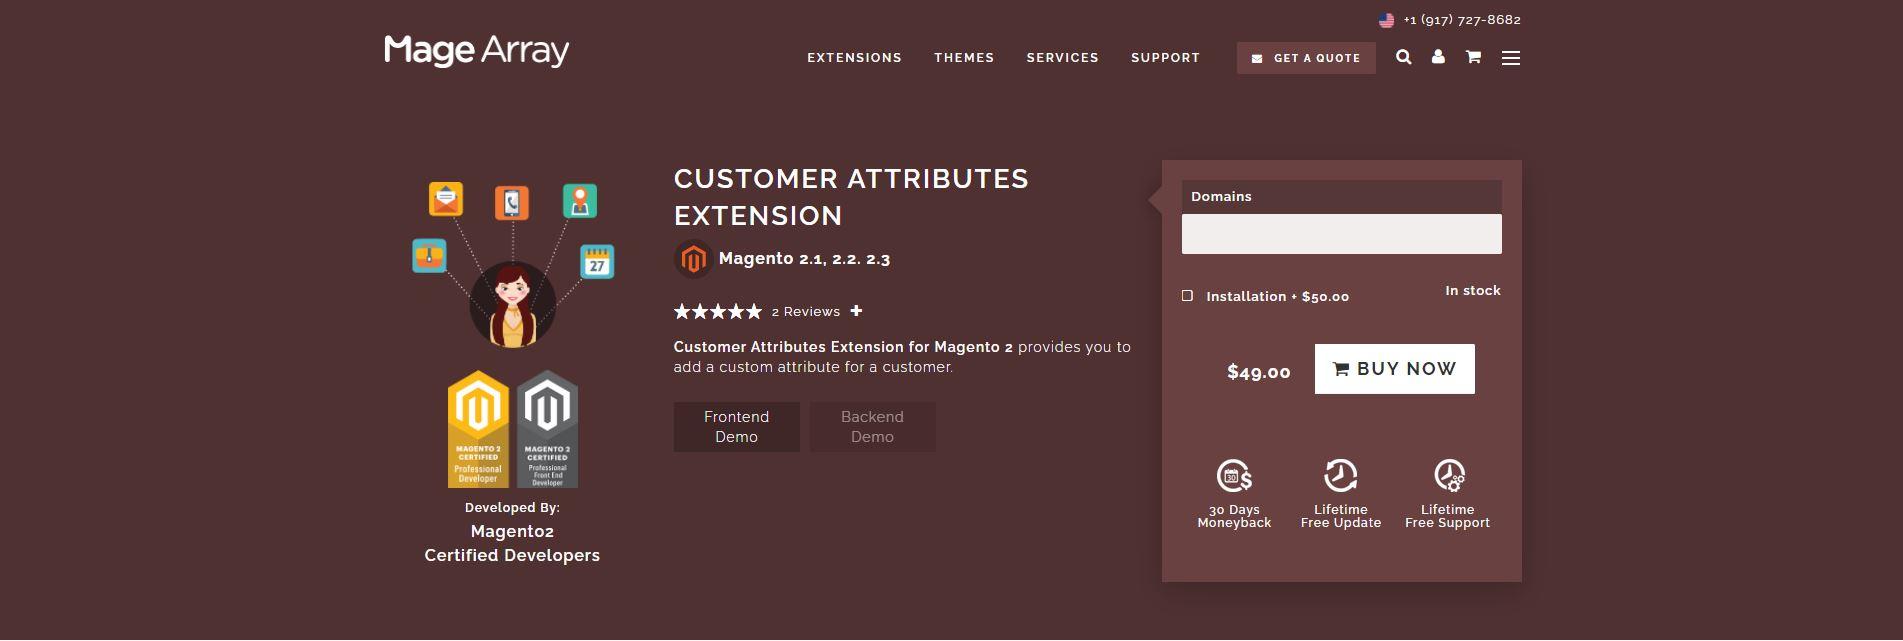 Magento customer attributes extension